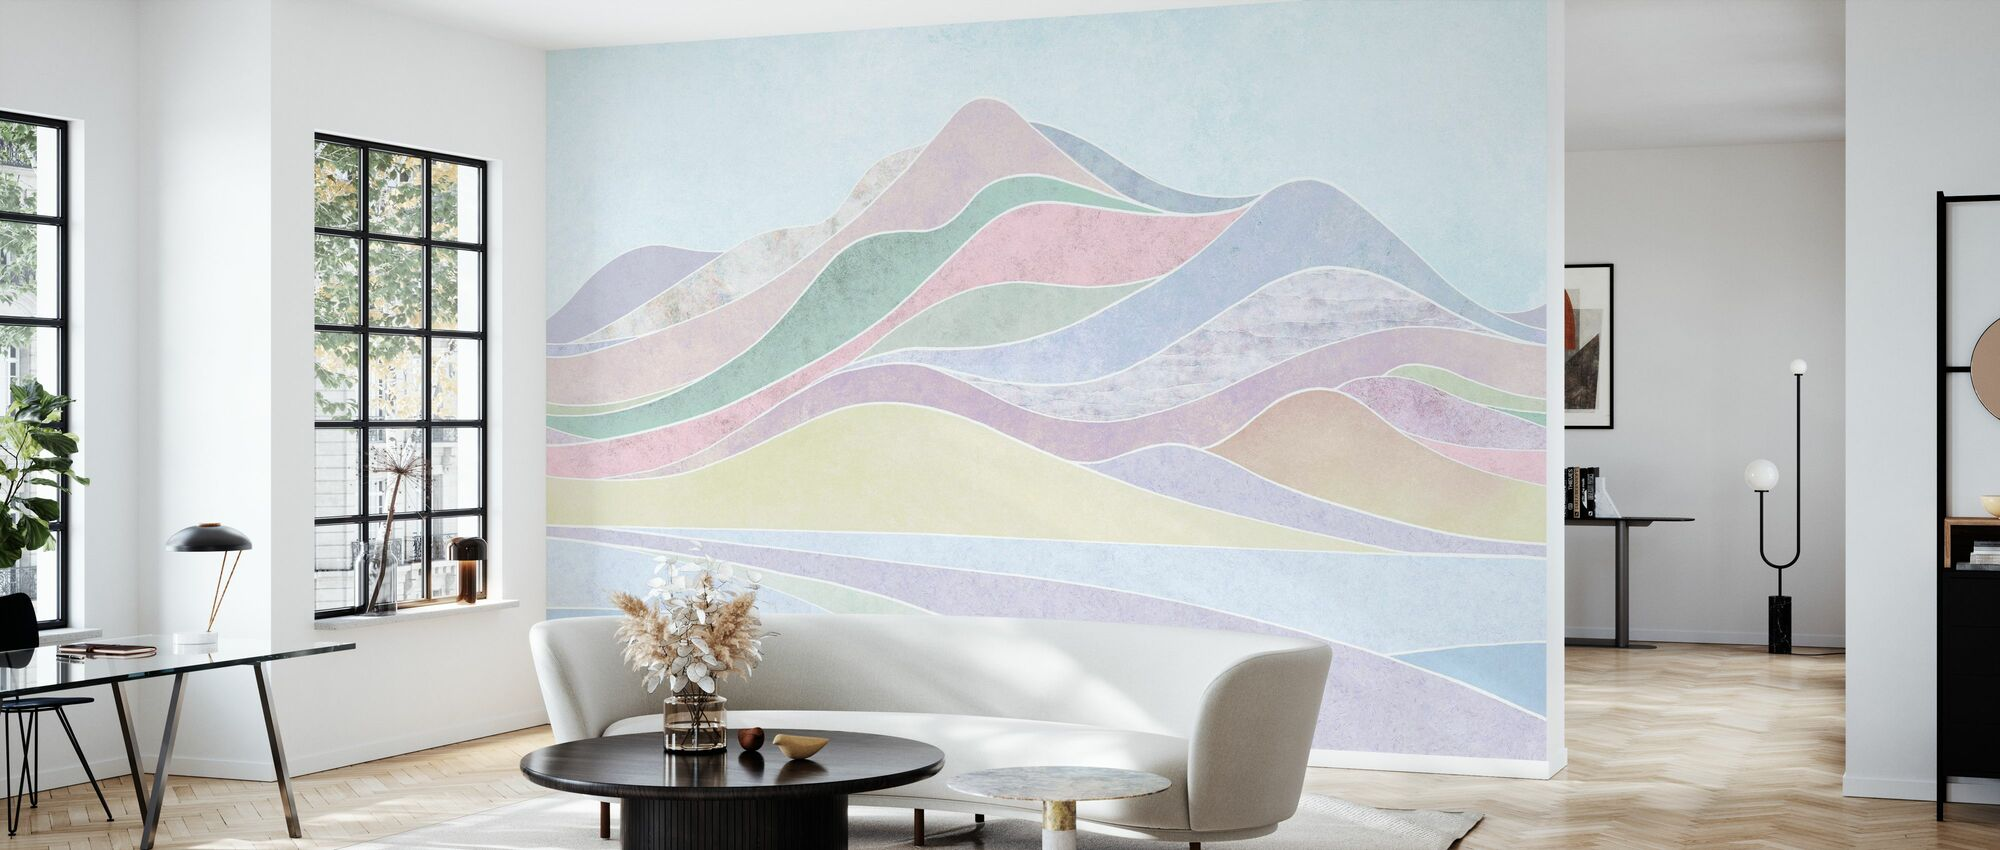 Concord Landskap - Pastell - Tapet - Stue